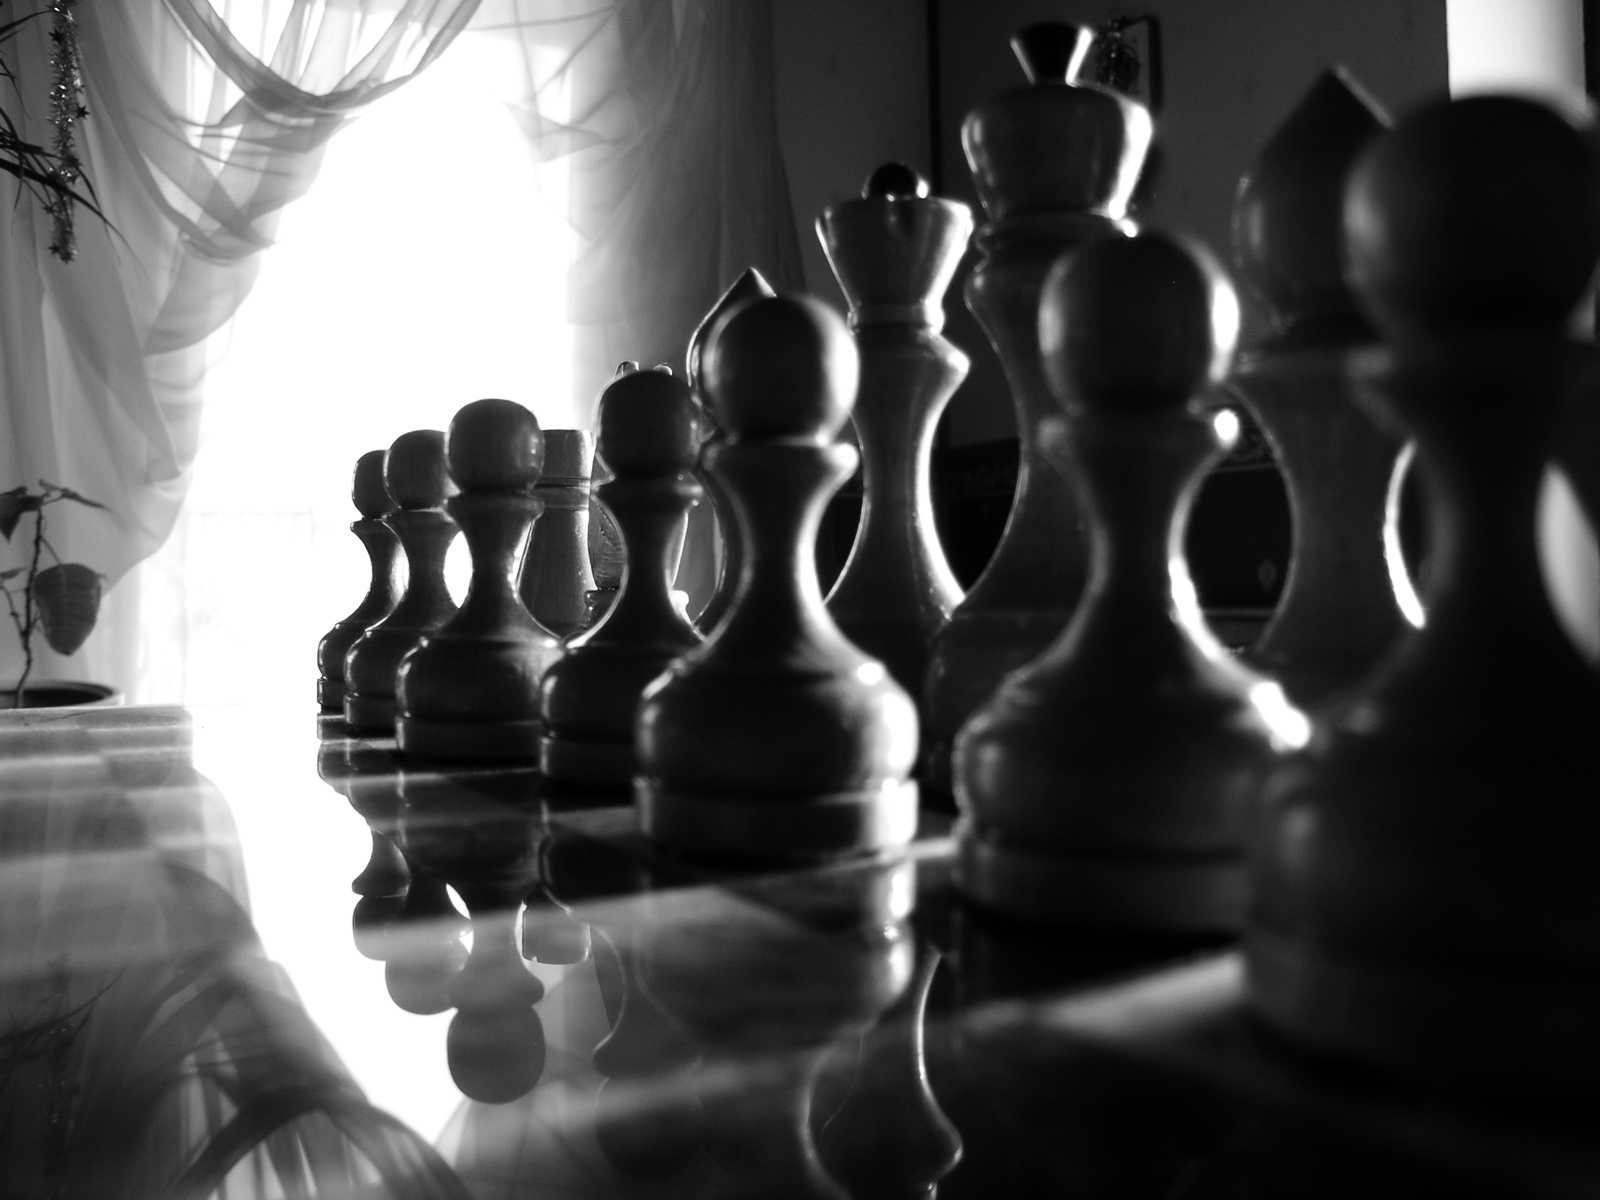 Chess Knight Wallpaper Hd